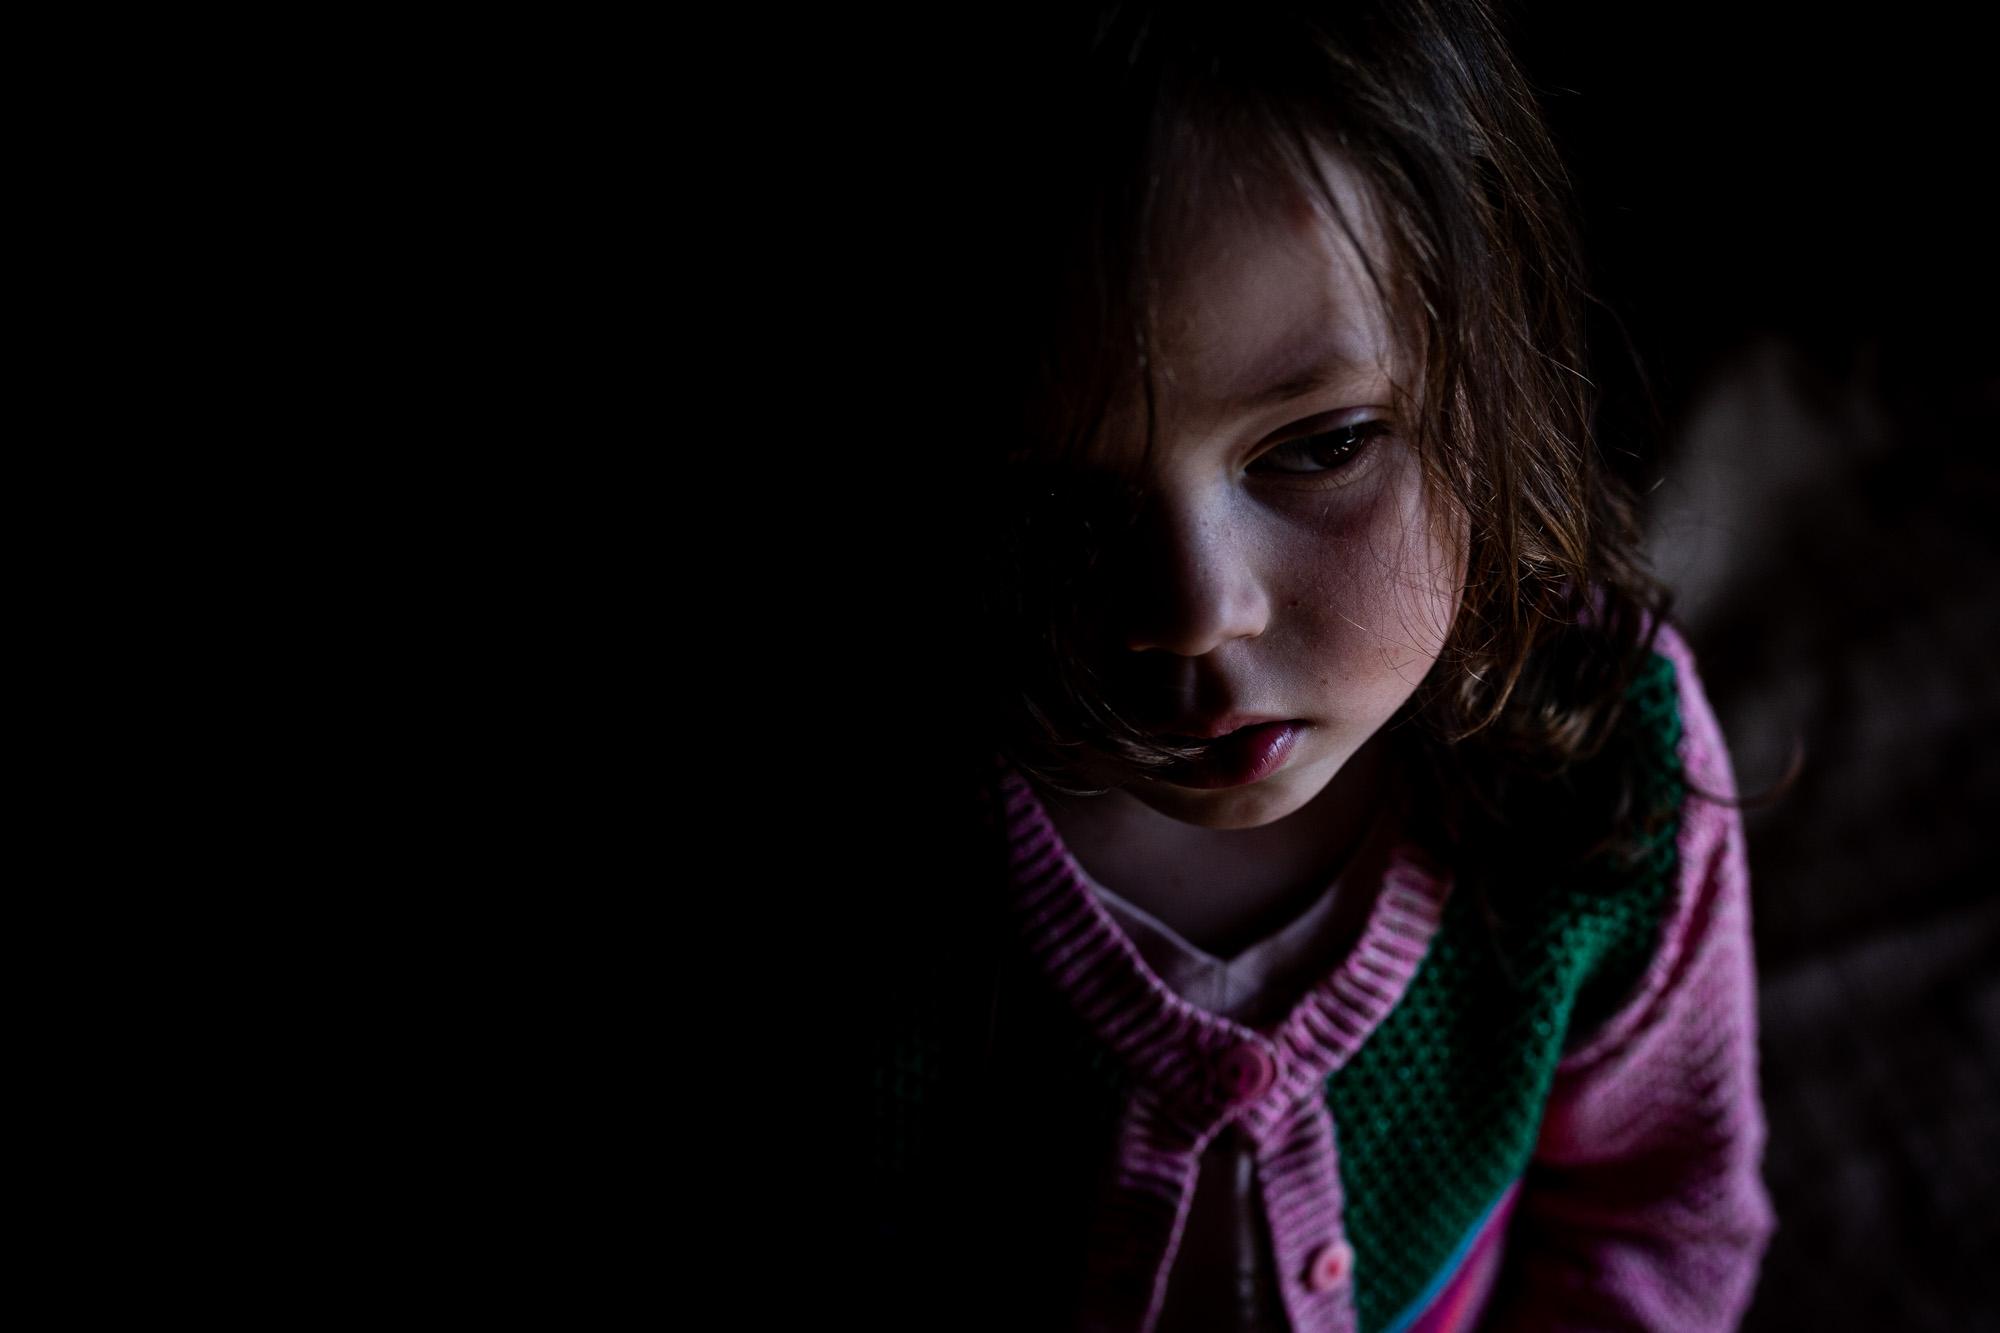 Ein Mädchenportrait.